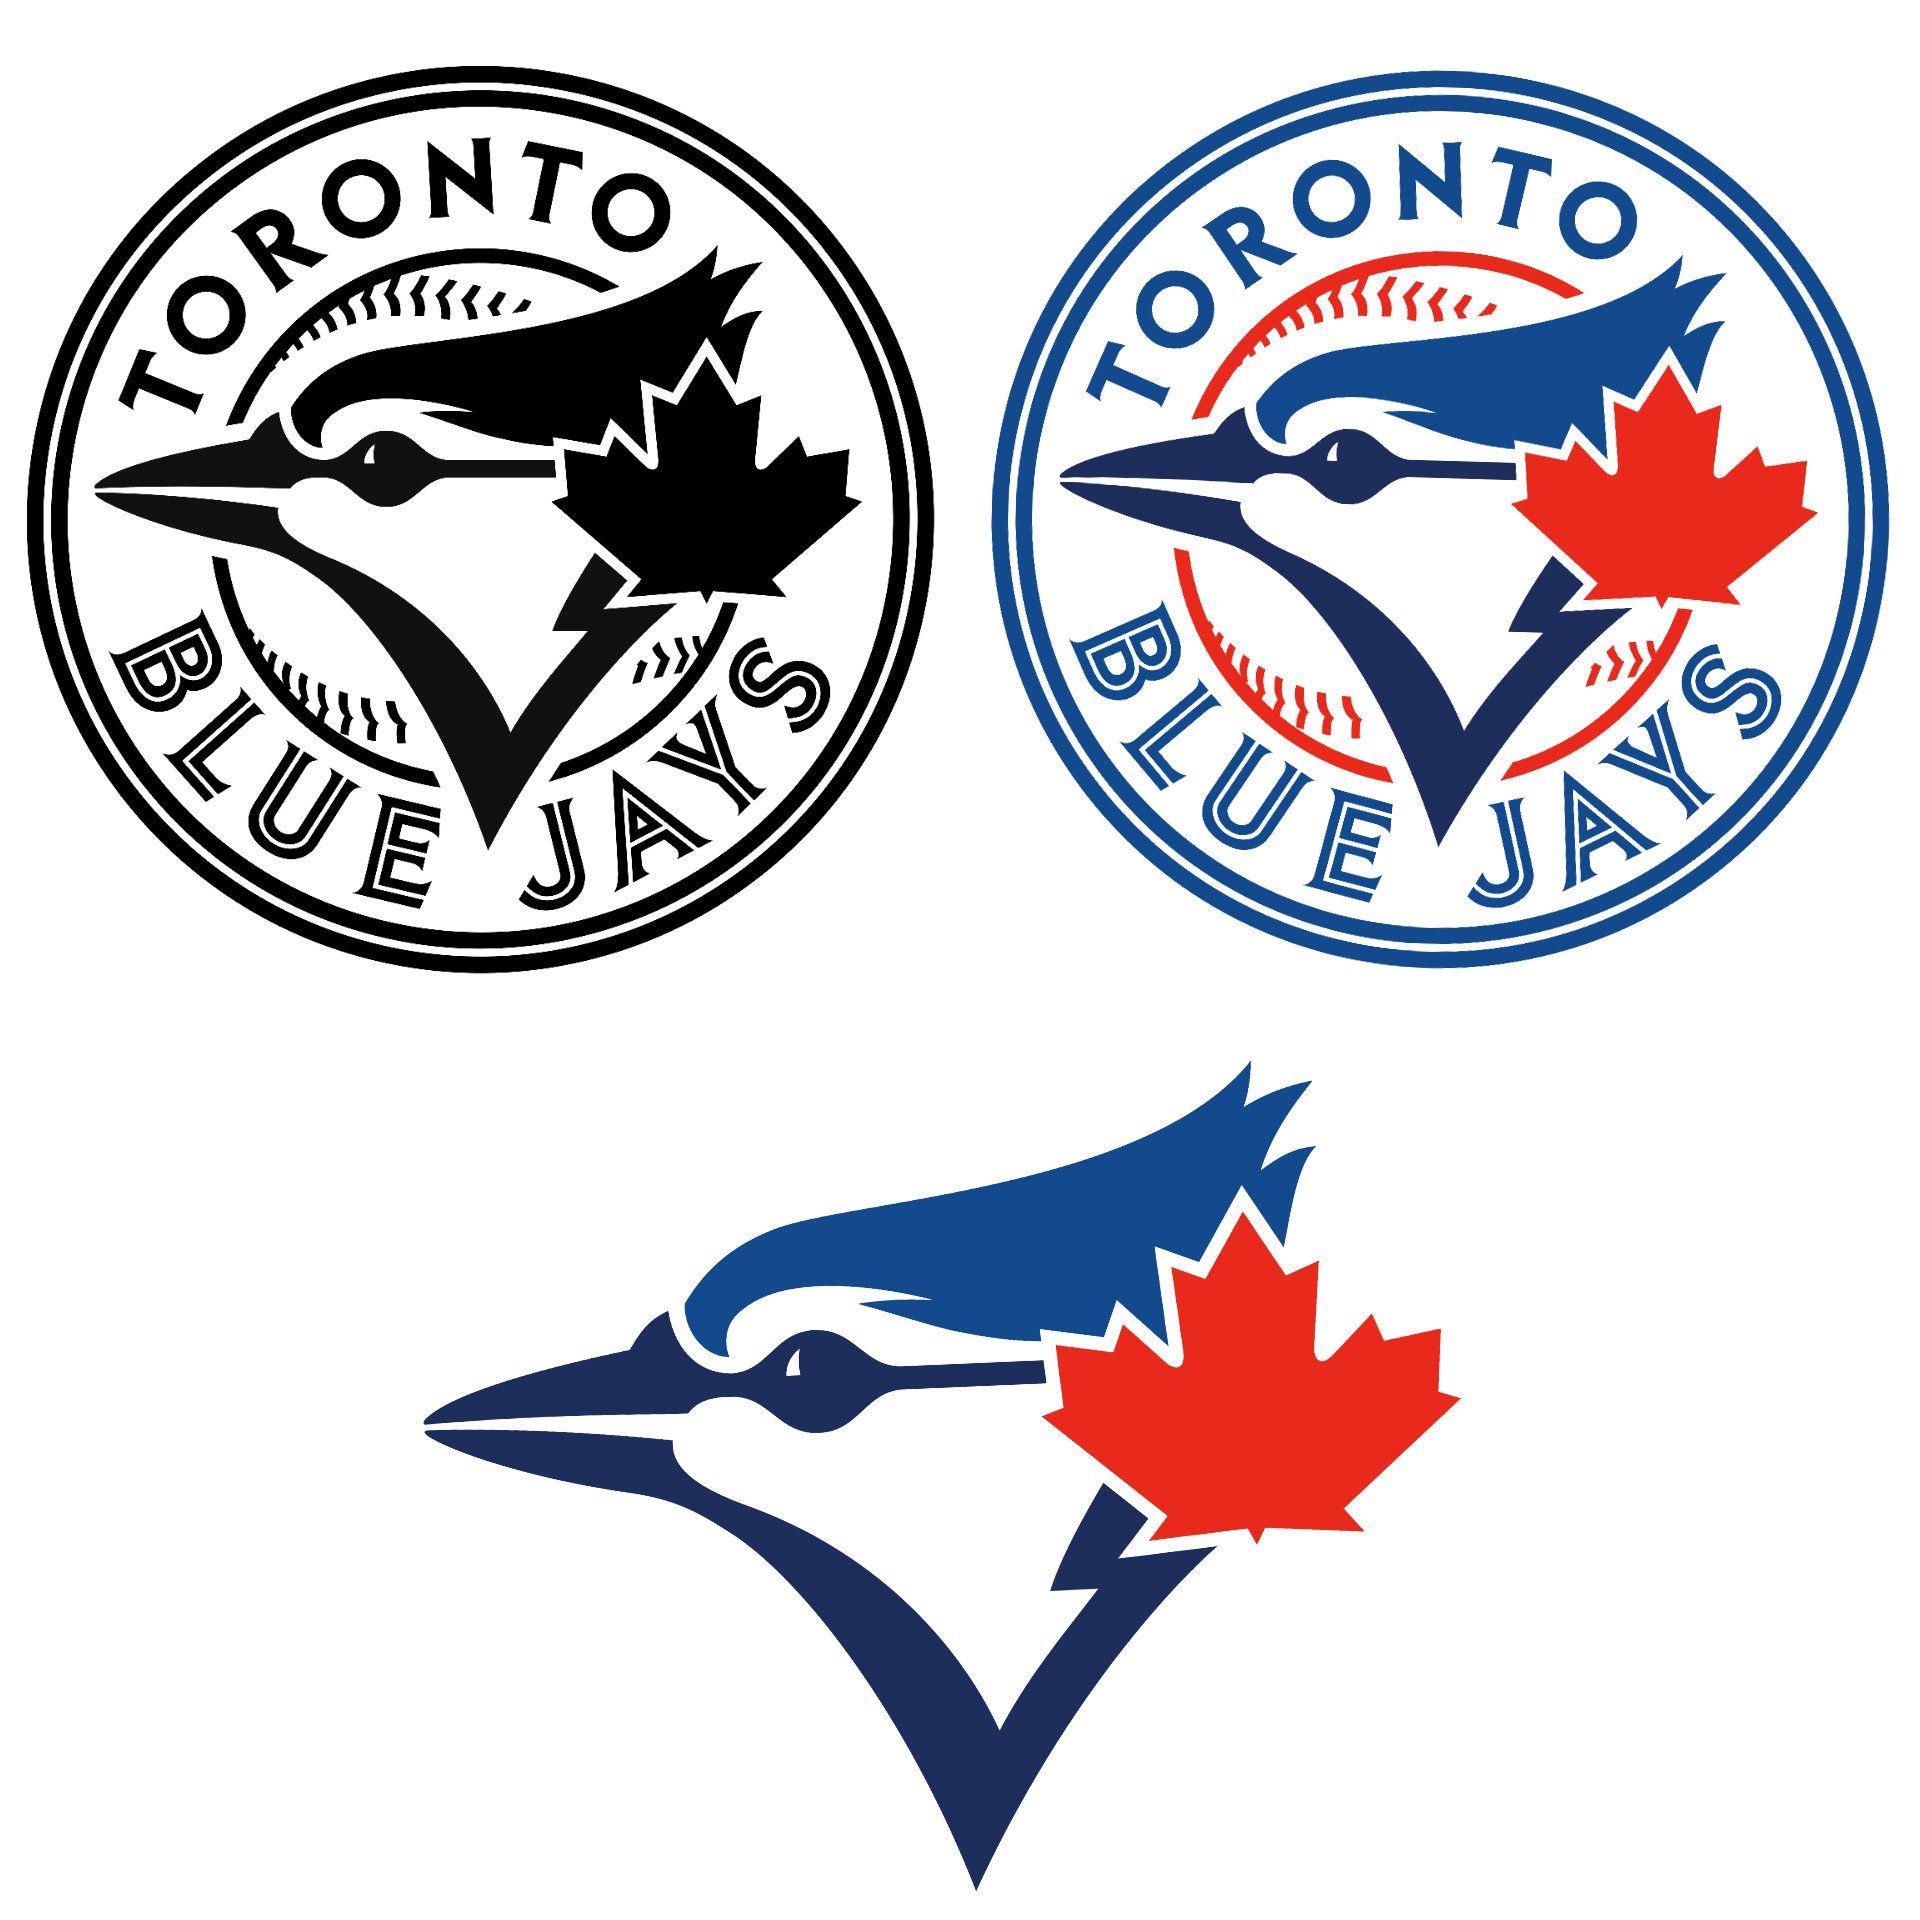 Toronto Blue Jays Mlb Logo Logo Svg Eps Png Jpg Pdf Etsy In 2021 Toronto Blue Jays Expos Logo Toronto Blue Jays Logo